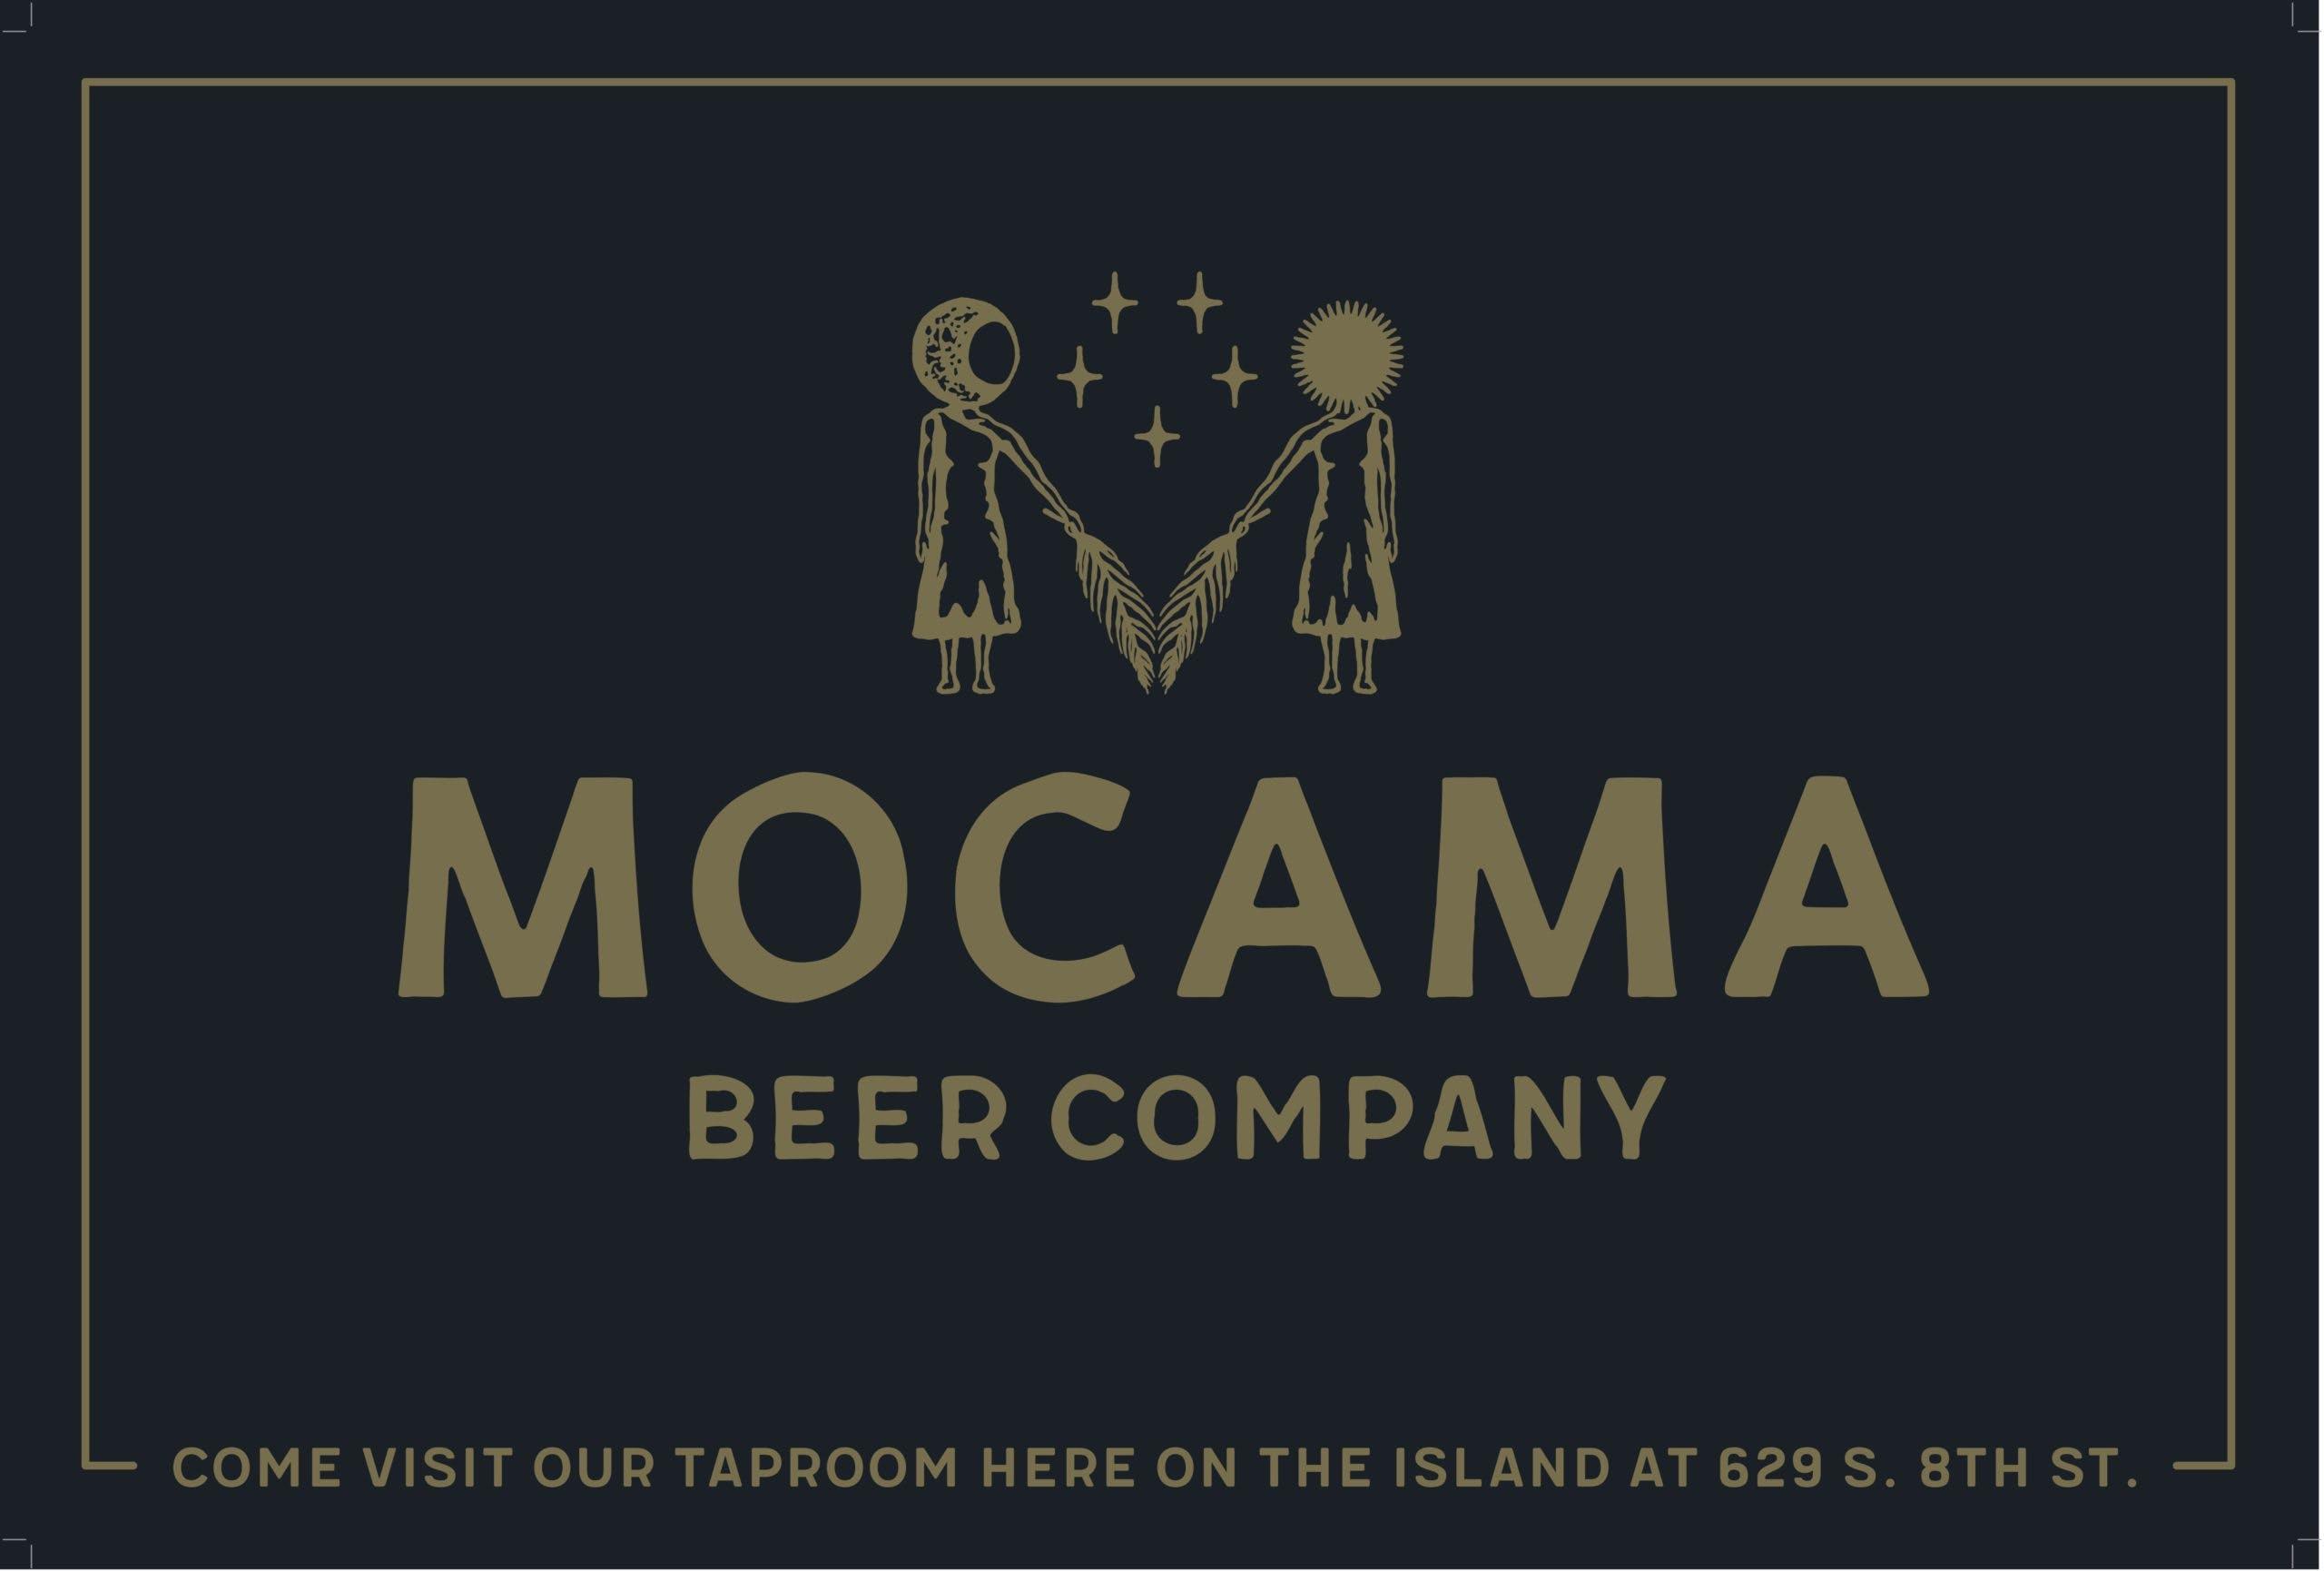 MOCAMA SIGN 36x24